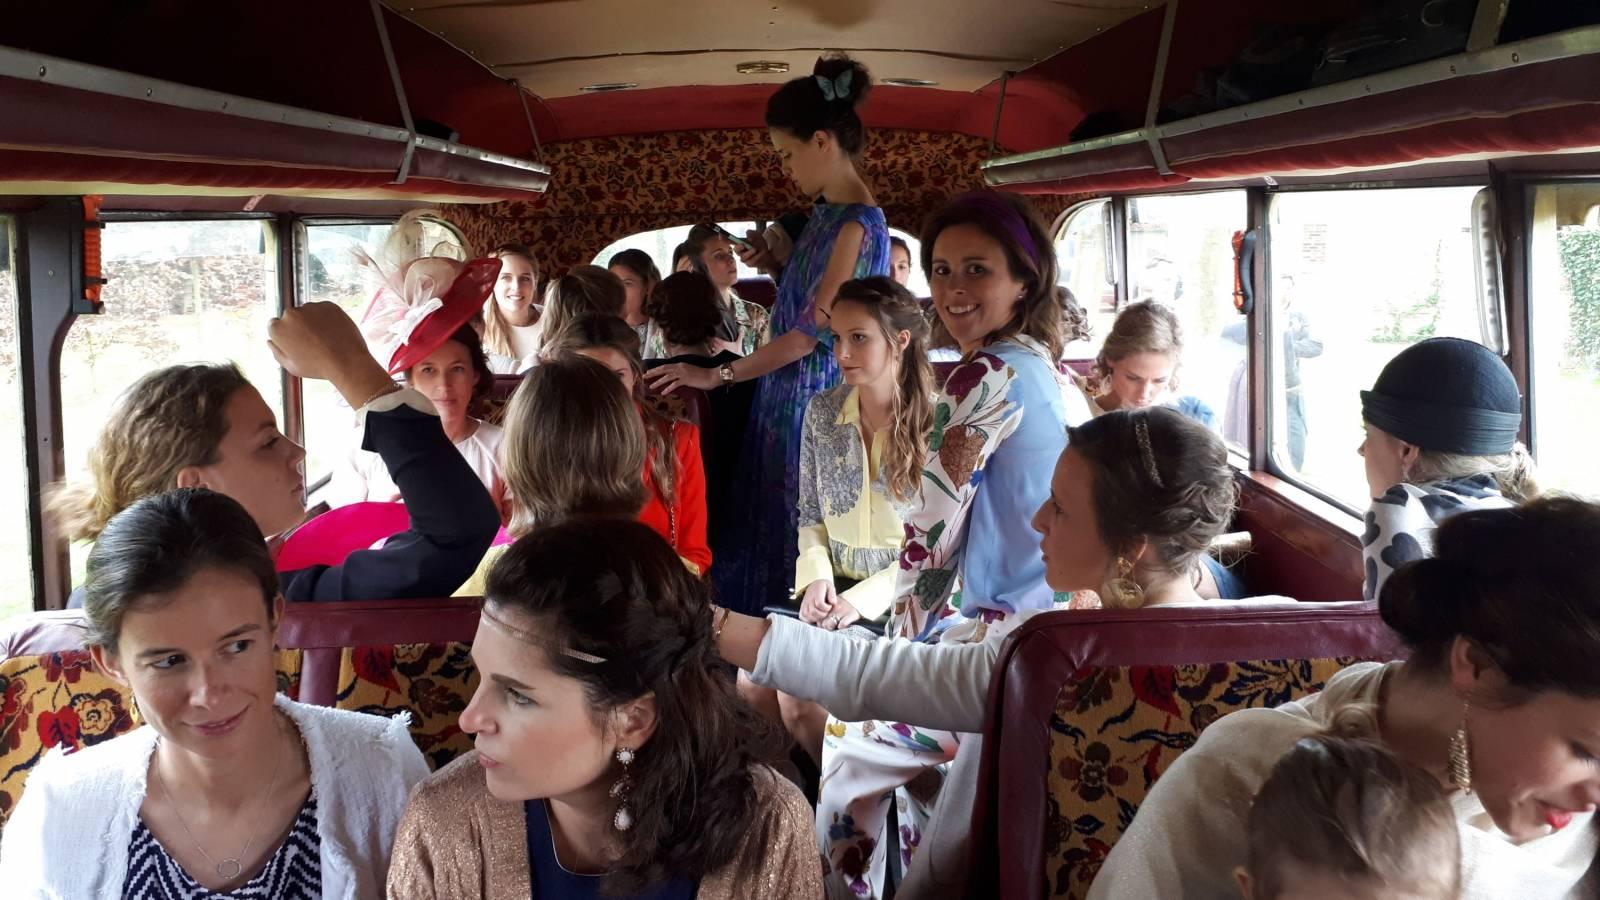 The London Ceremony Bus - Trouwvervoer - Ceremonievervoer - Bus - House of Weddings - 7